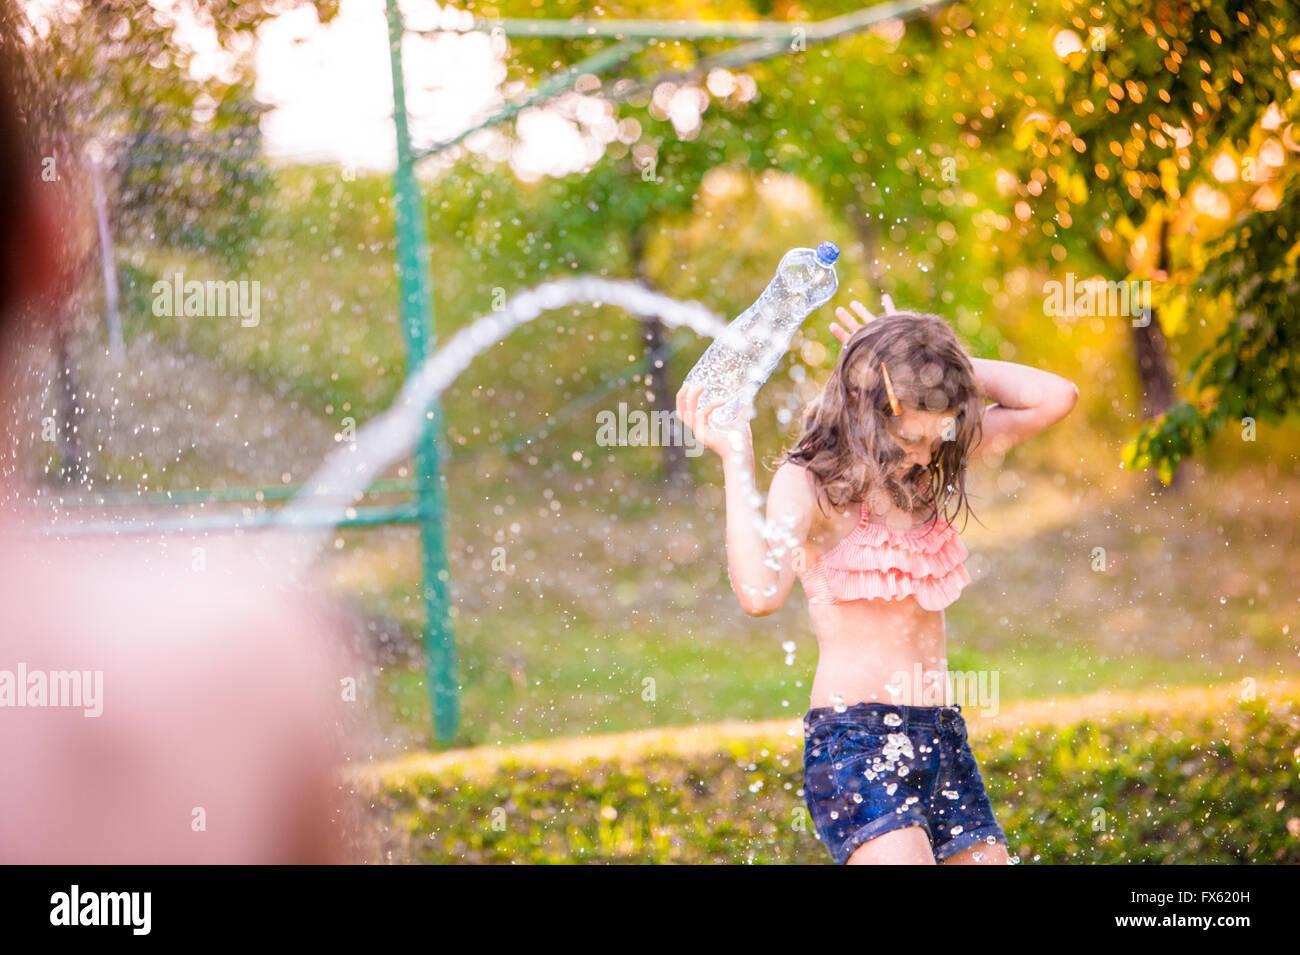 Unrecognizable boy splashing girl with water gun, sunny summer - Stock Image